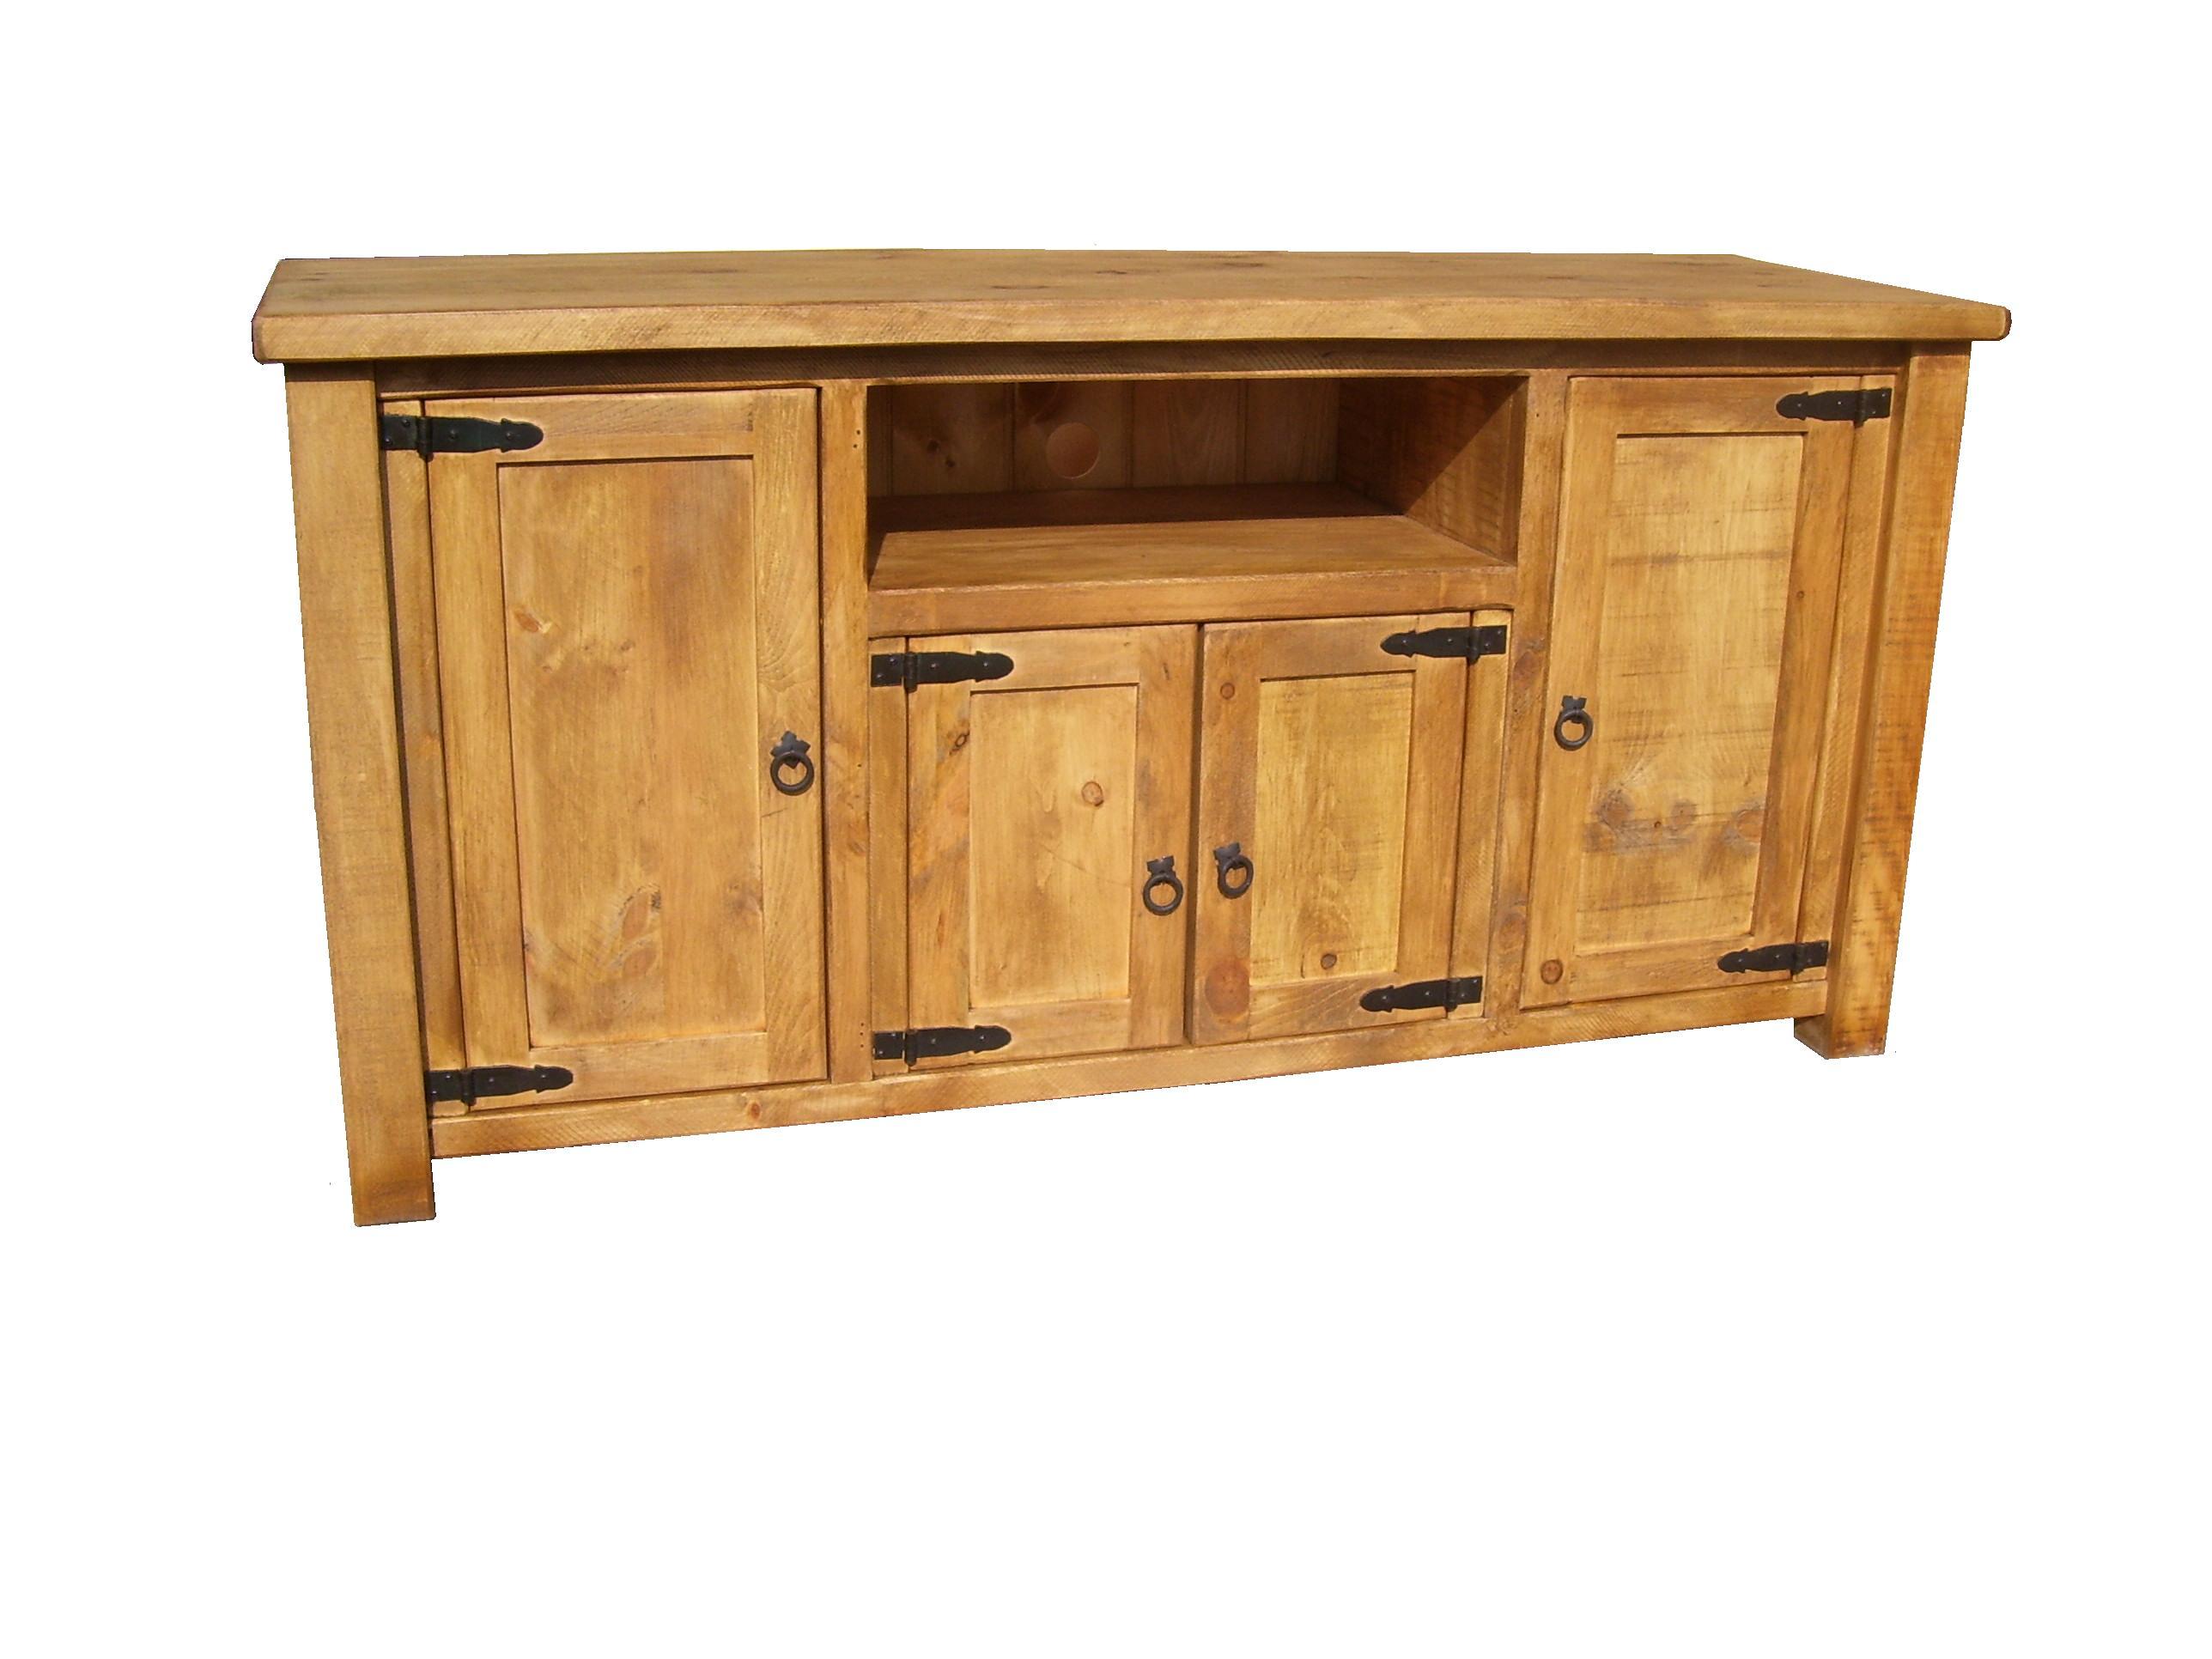 Dovetails Bespoke Furniture In Staffordshire Derbyshire # Hifi Furniture Wood High Quality